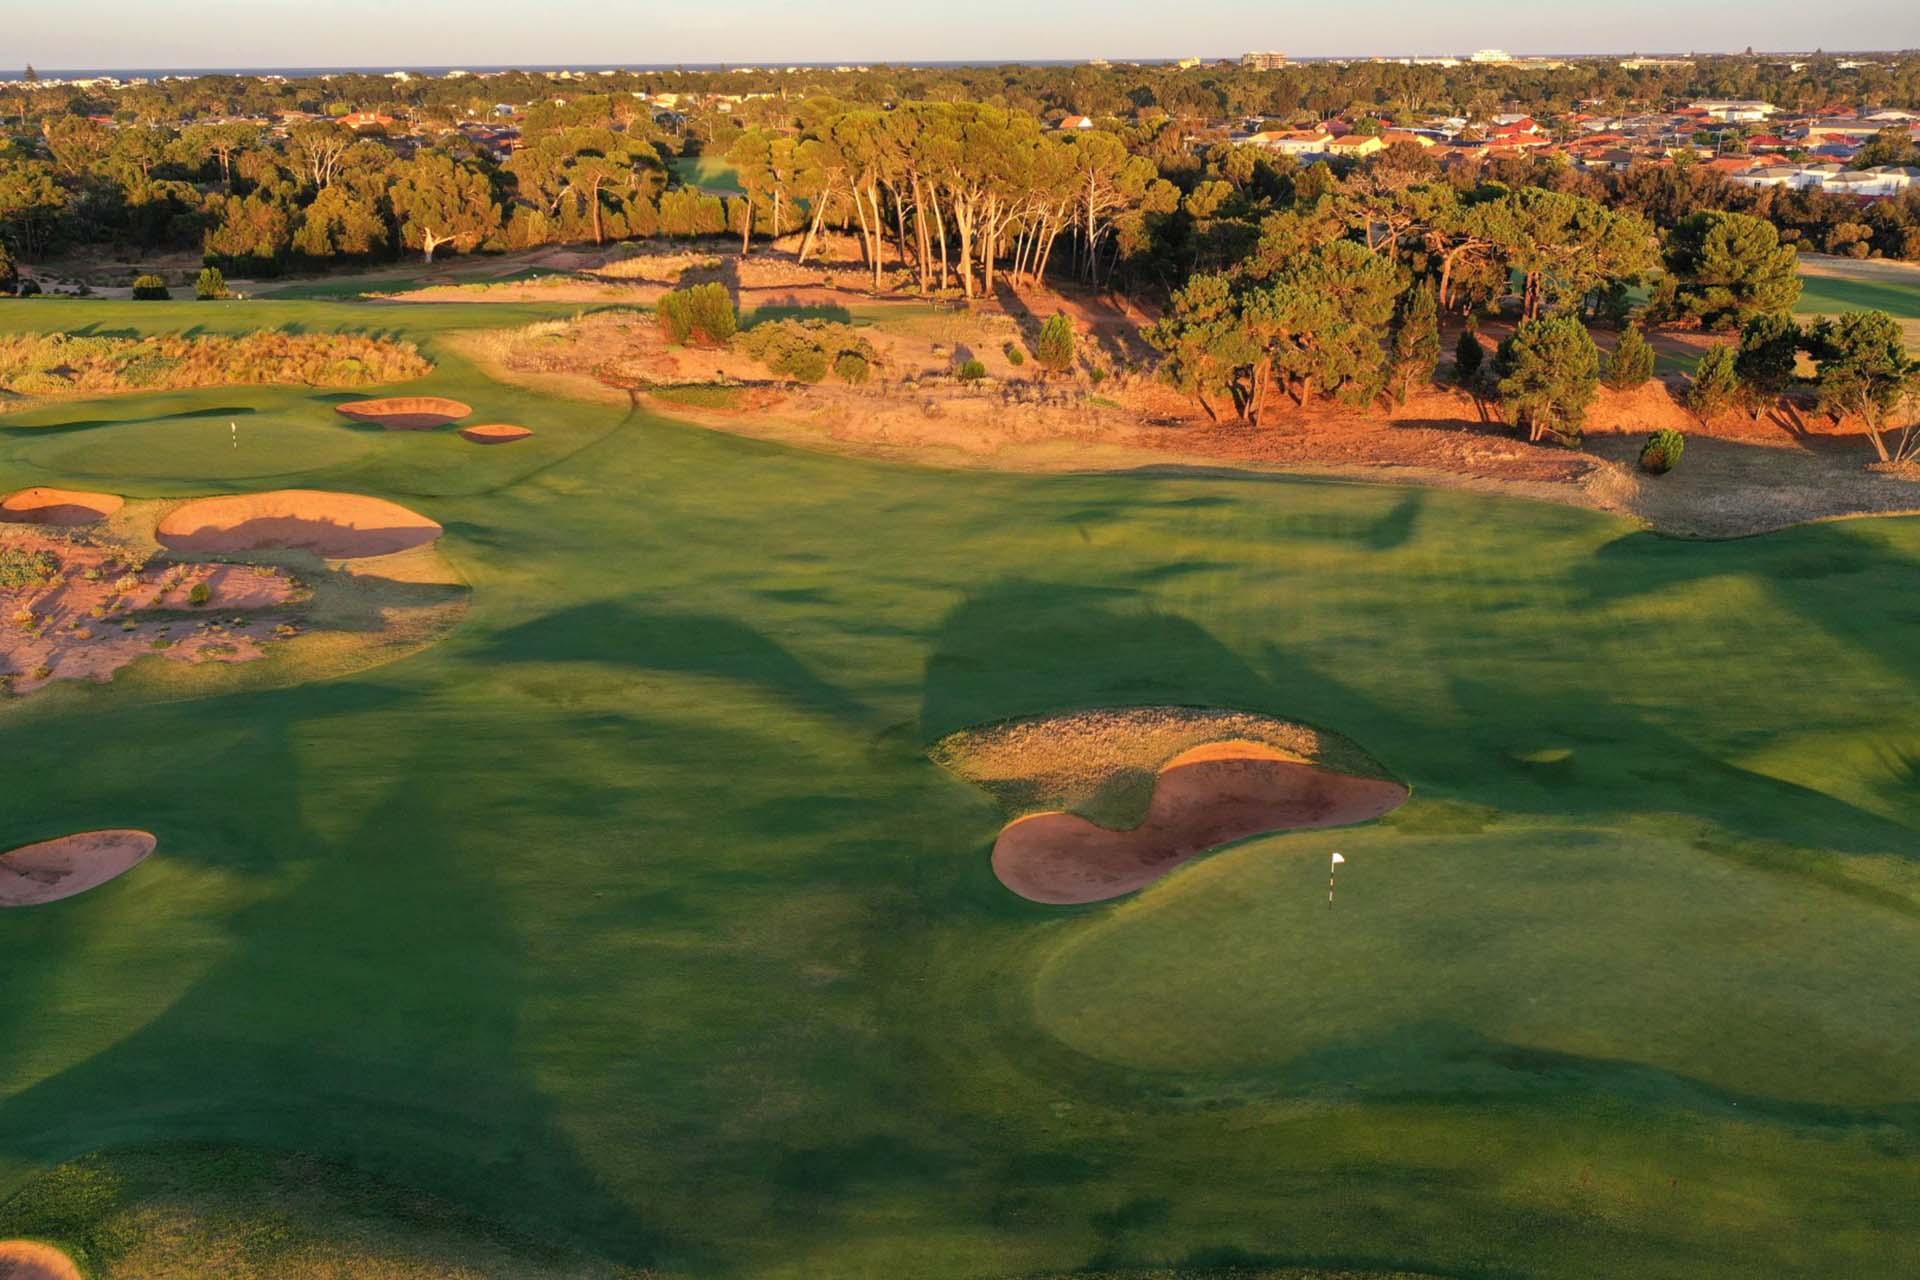 Royal Adelaide Golf Club - Par 4, 4th Green & Par 4, 6th Green / Photo: Gary Lisbon Golf Photography